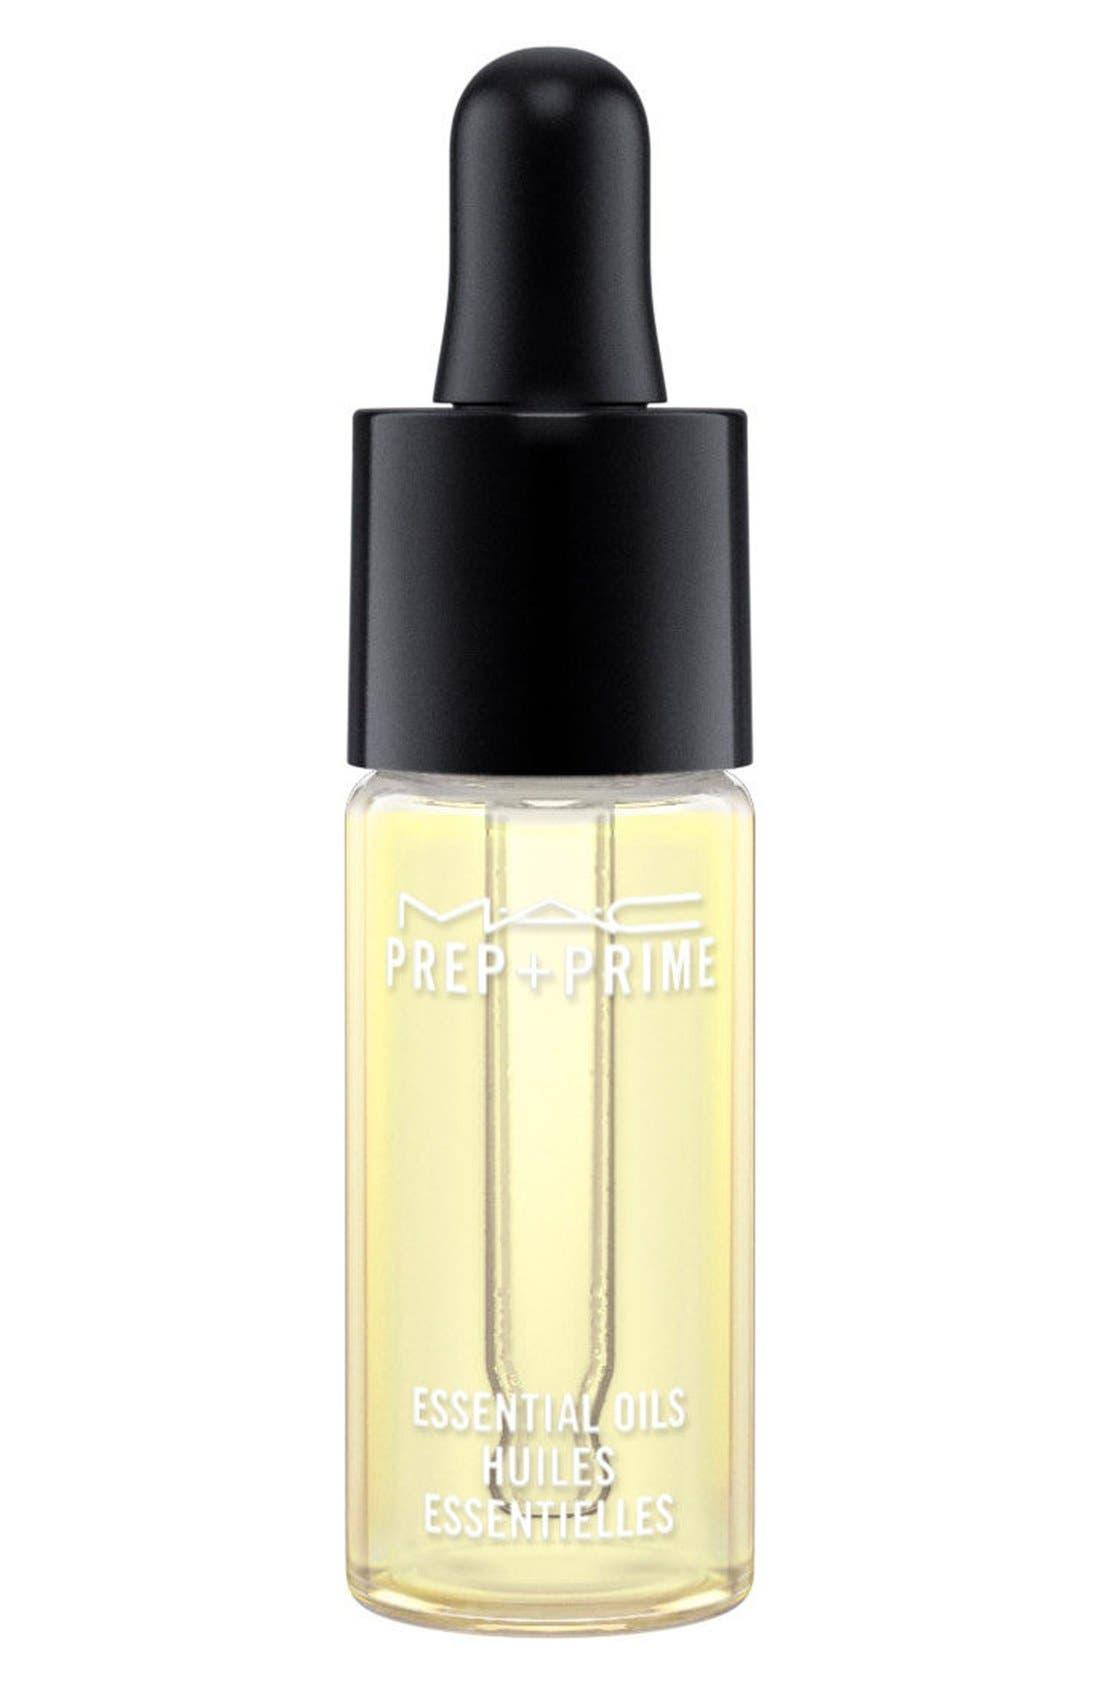 MAC Prep + Prime Grapefruit & Chamomile Essential Oils